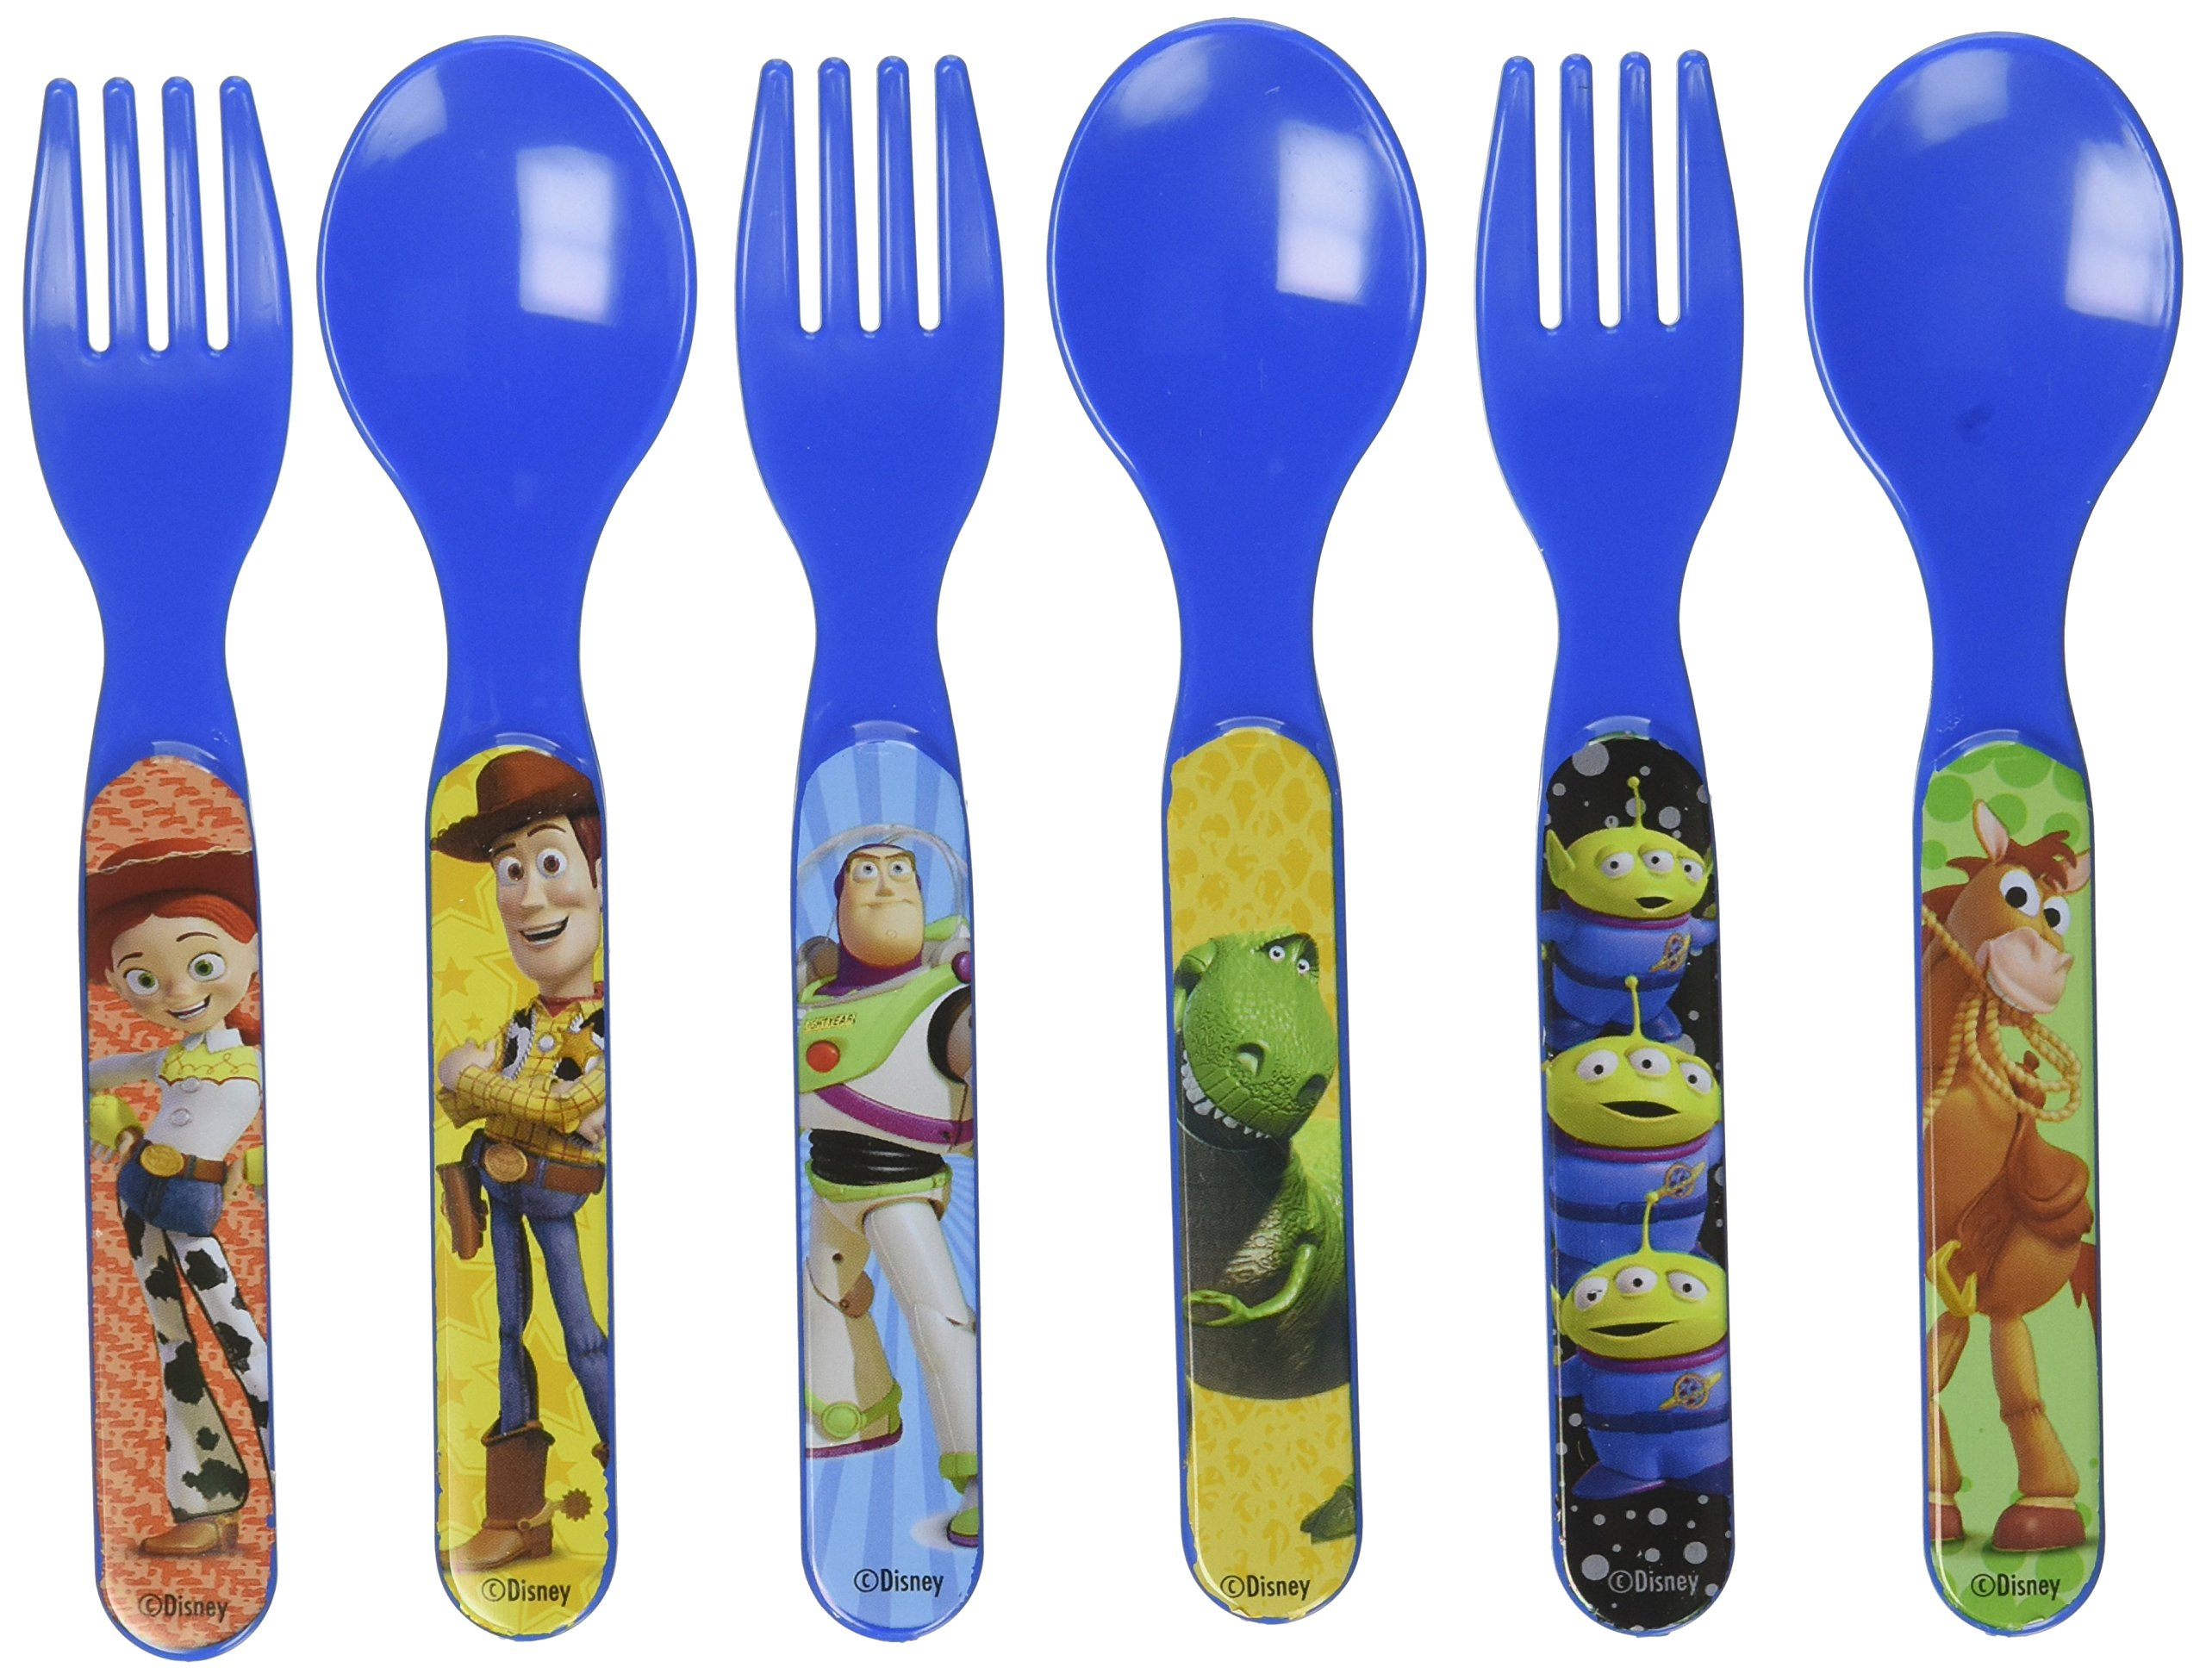 Toy Story Six Piece Fork & Spoon Set by Disney